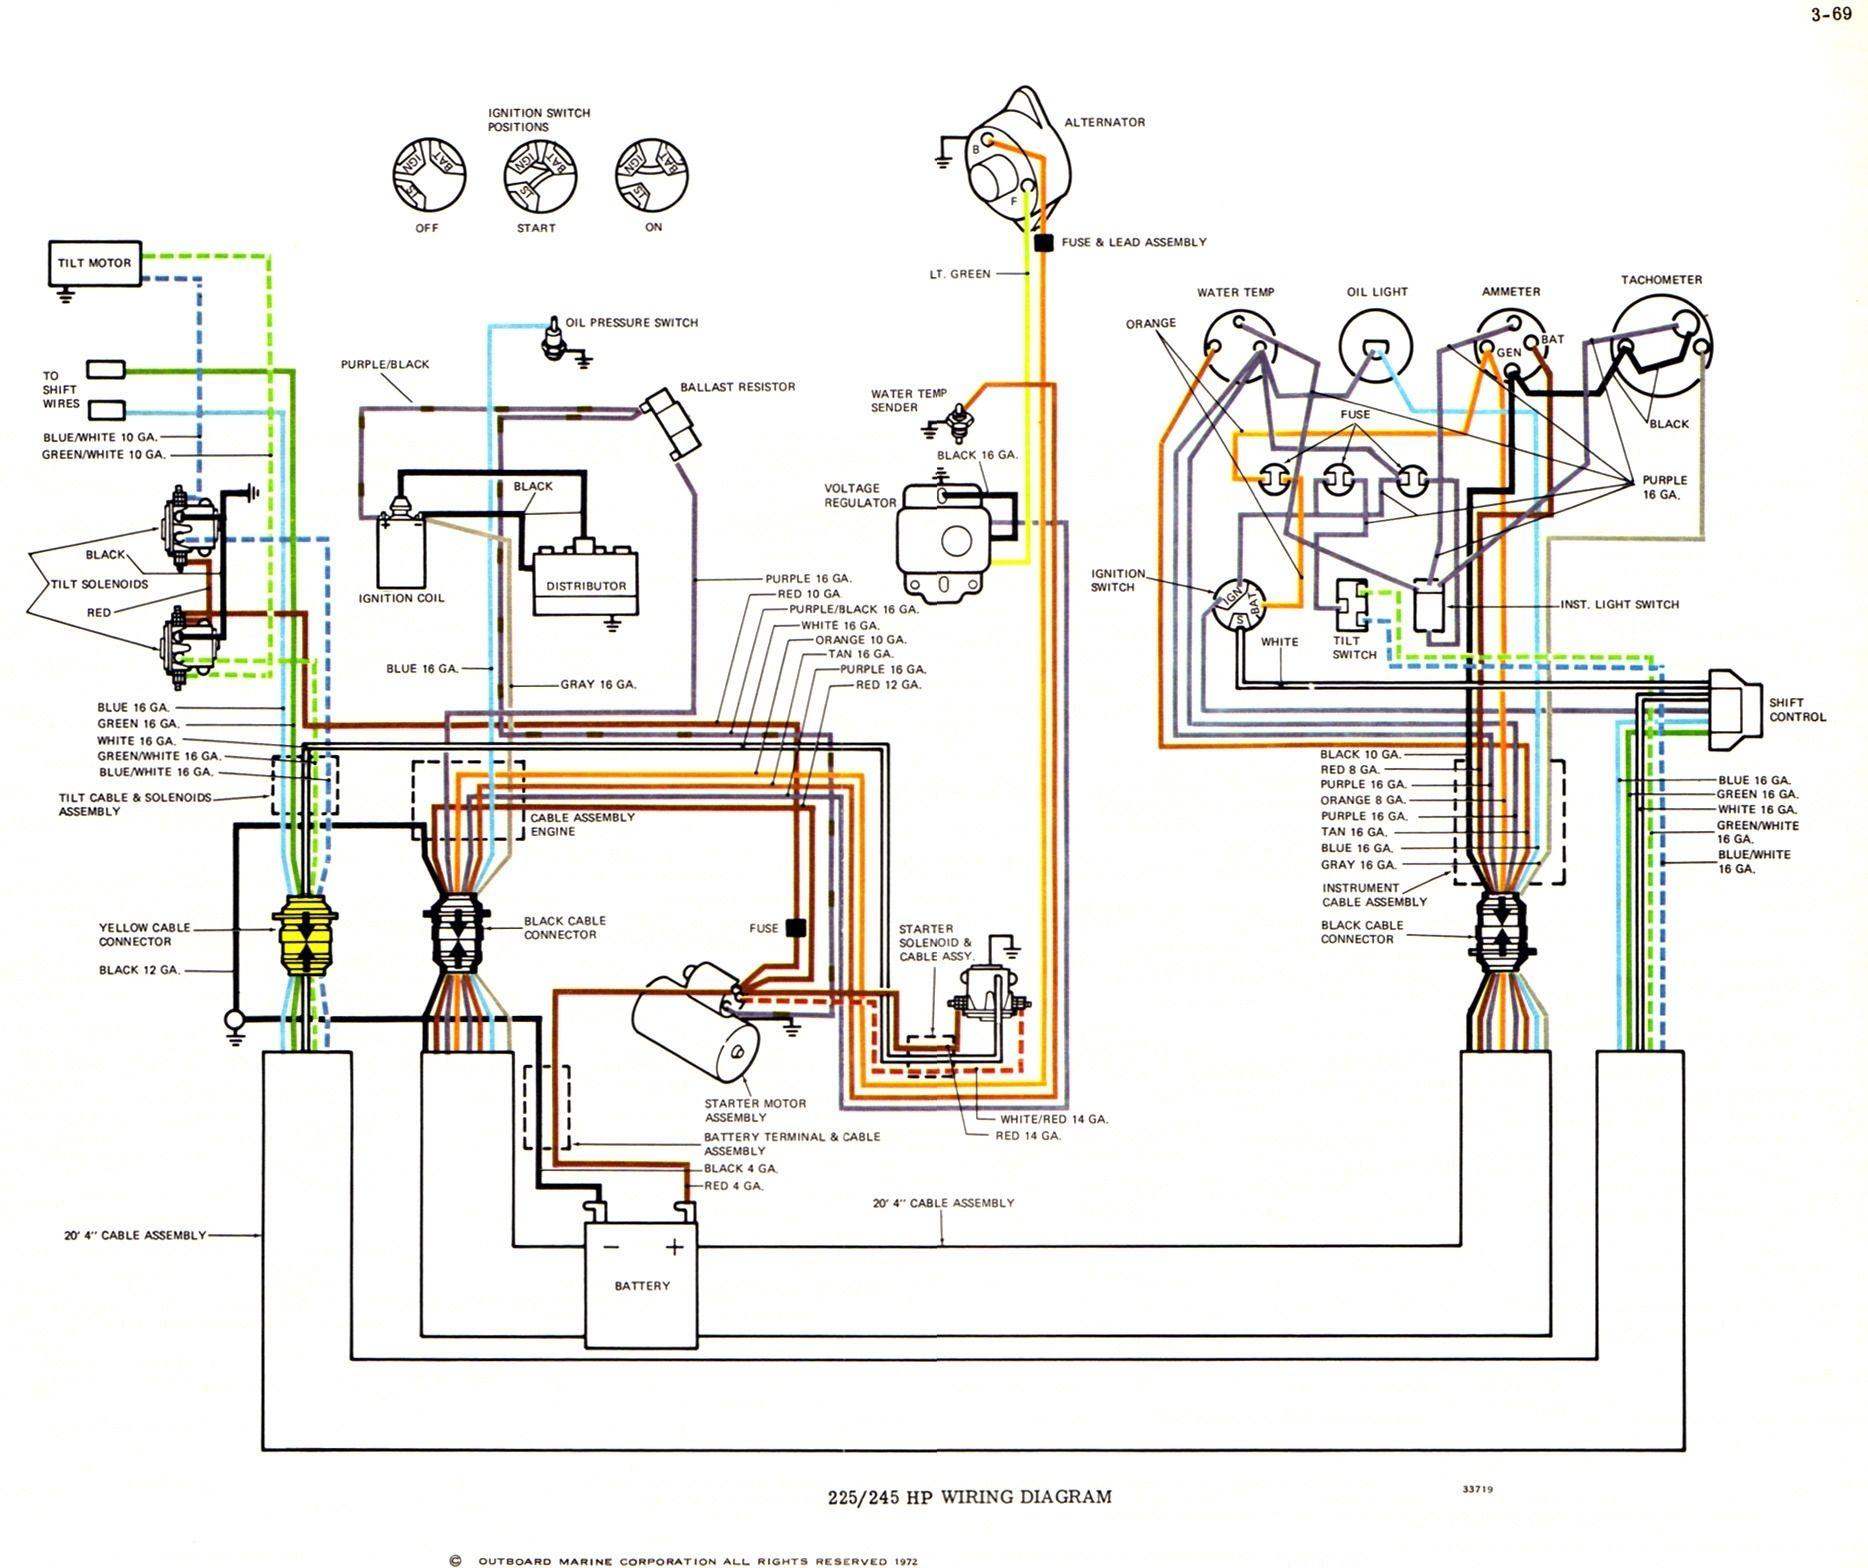 free wiring schematic 2005 yfz lr 8611  yamaha wiring diagram outboard free diagram  lr 8611  yamaha wiring diagram outboard